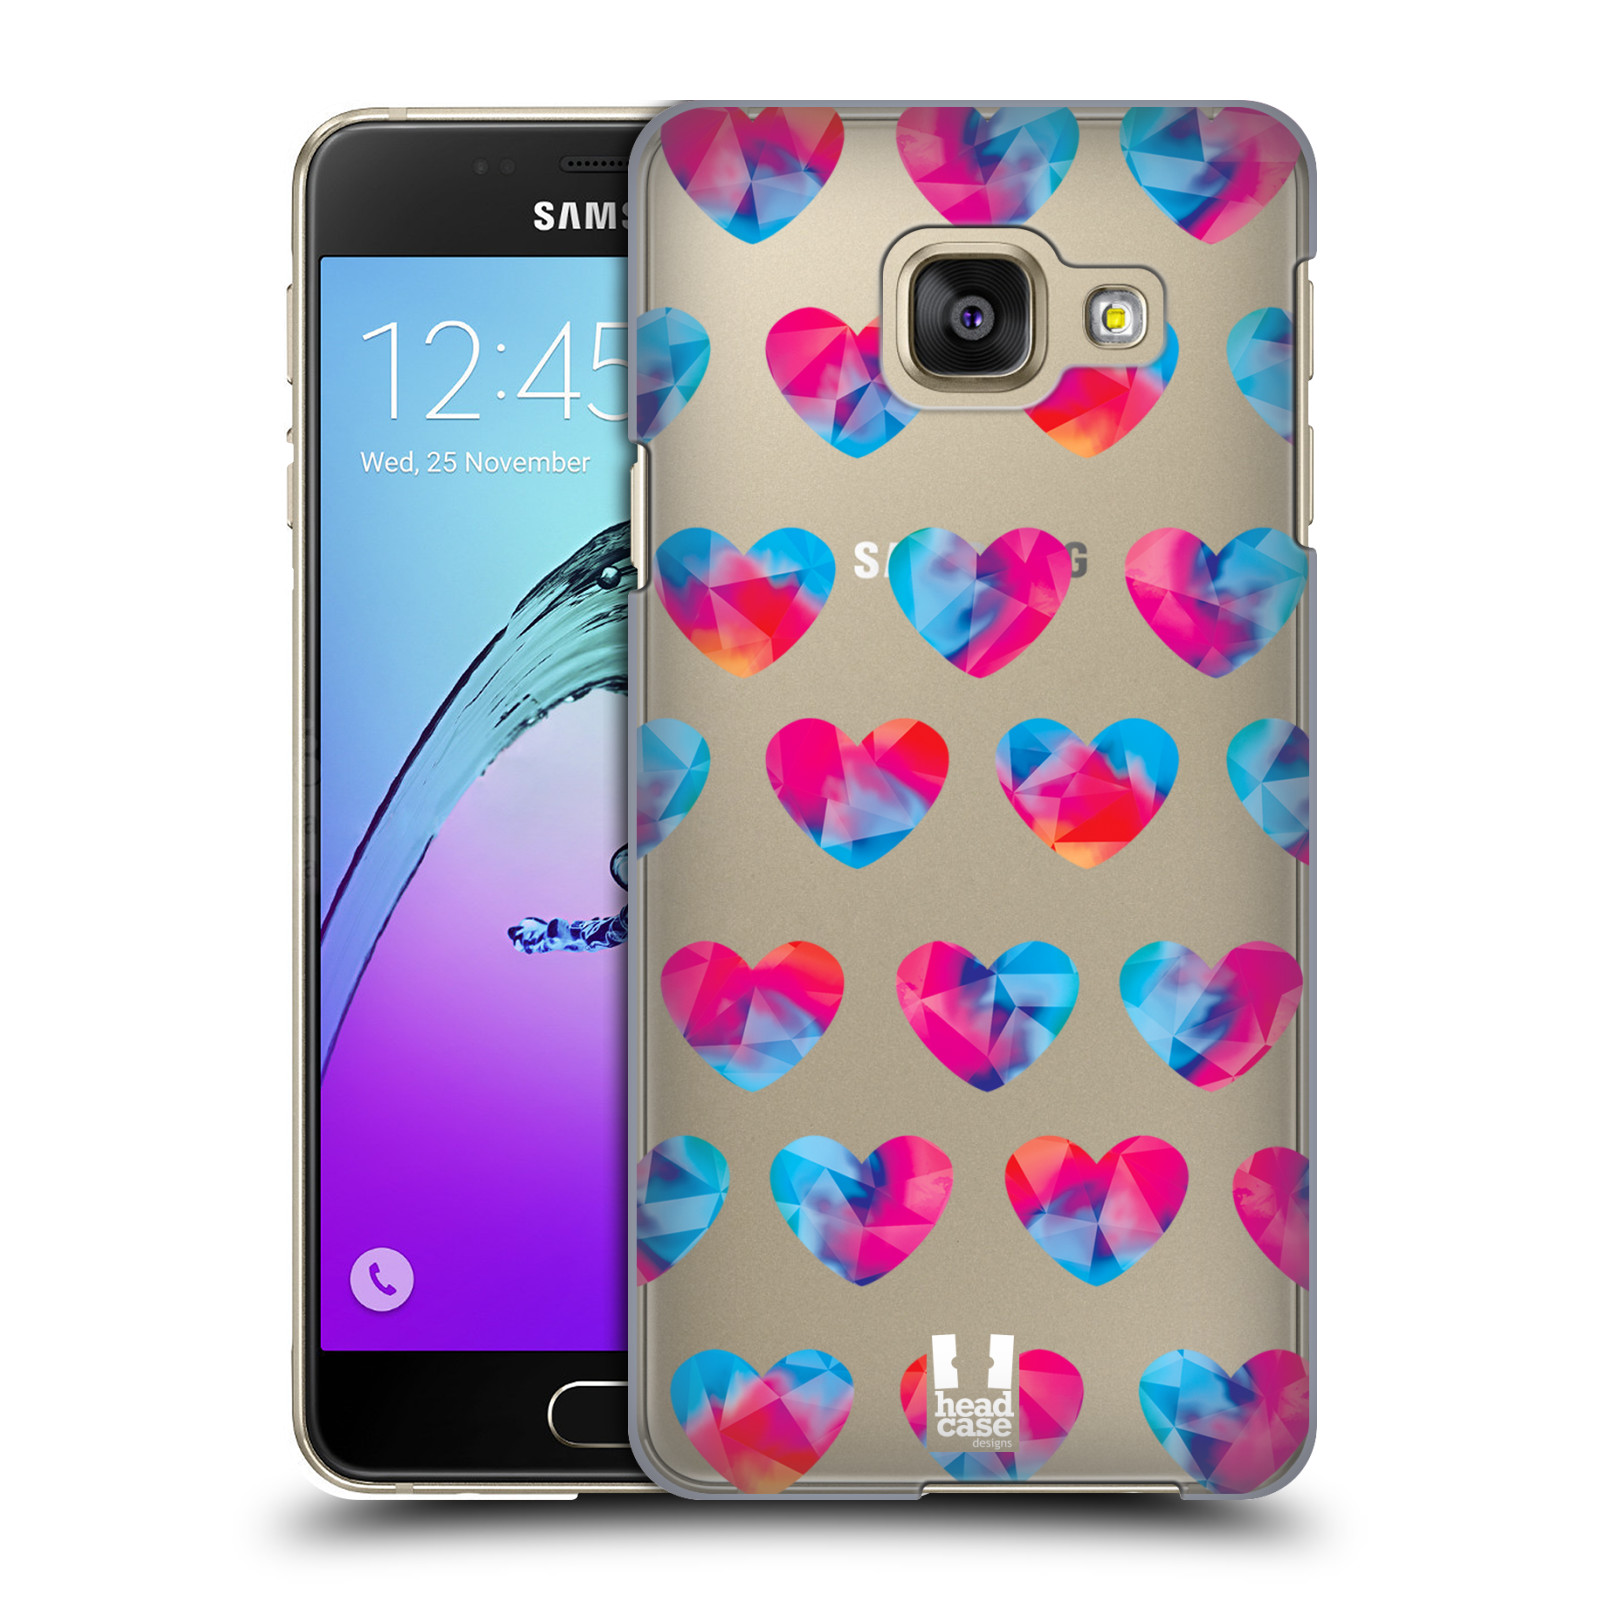 Plastové pouzdro na mobil Samsung Galaxy A3 (2016) - Head Case - Srdíčka hrající barvami